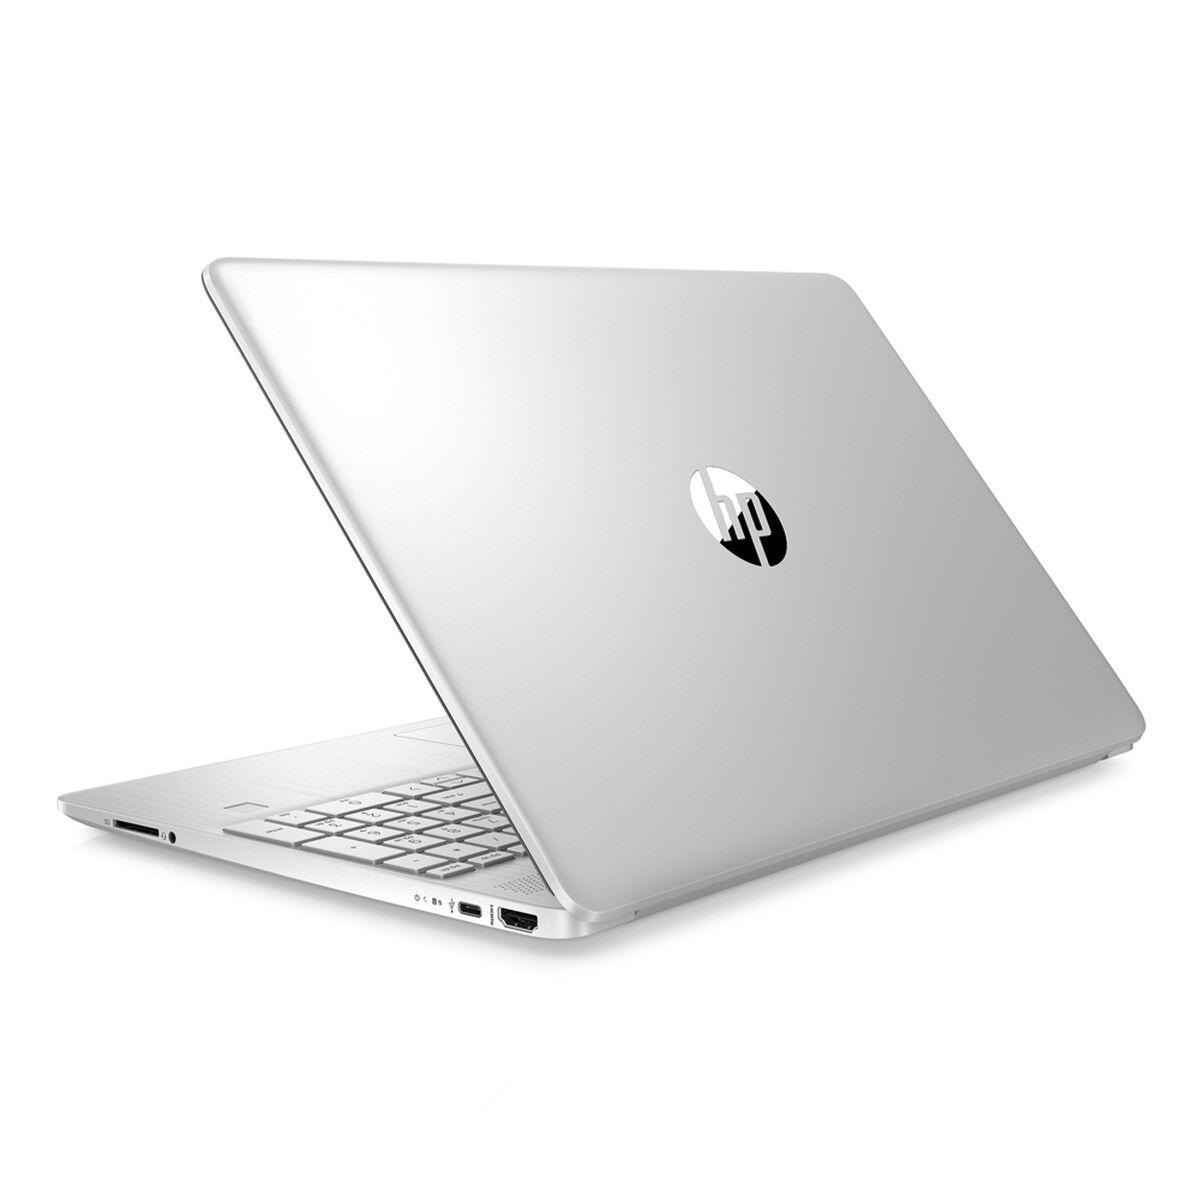 "Notebook HP 15-dy1010 Core i7 4GB 256GB SSD 15.6"" + 16GB Optane"